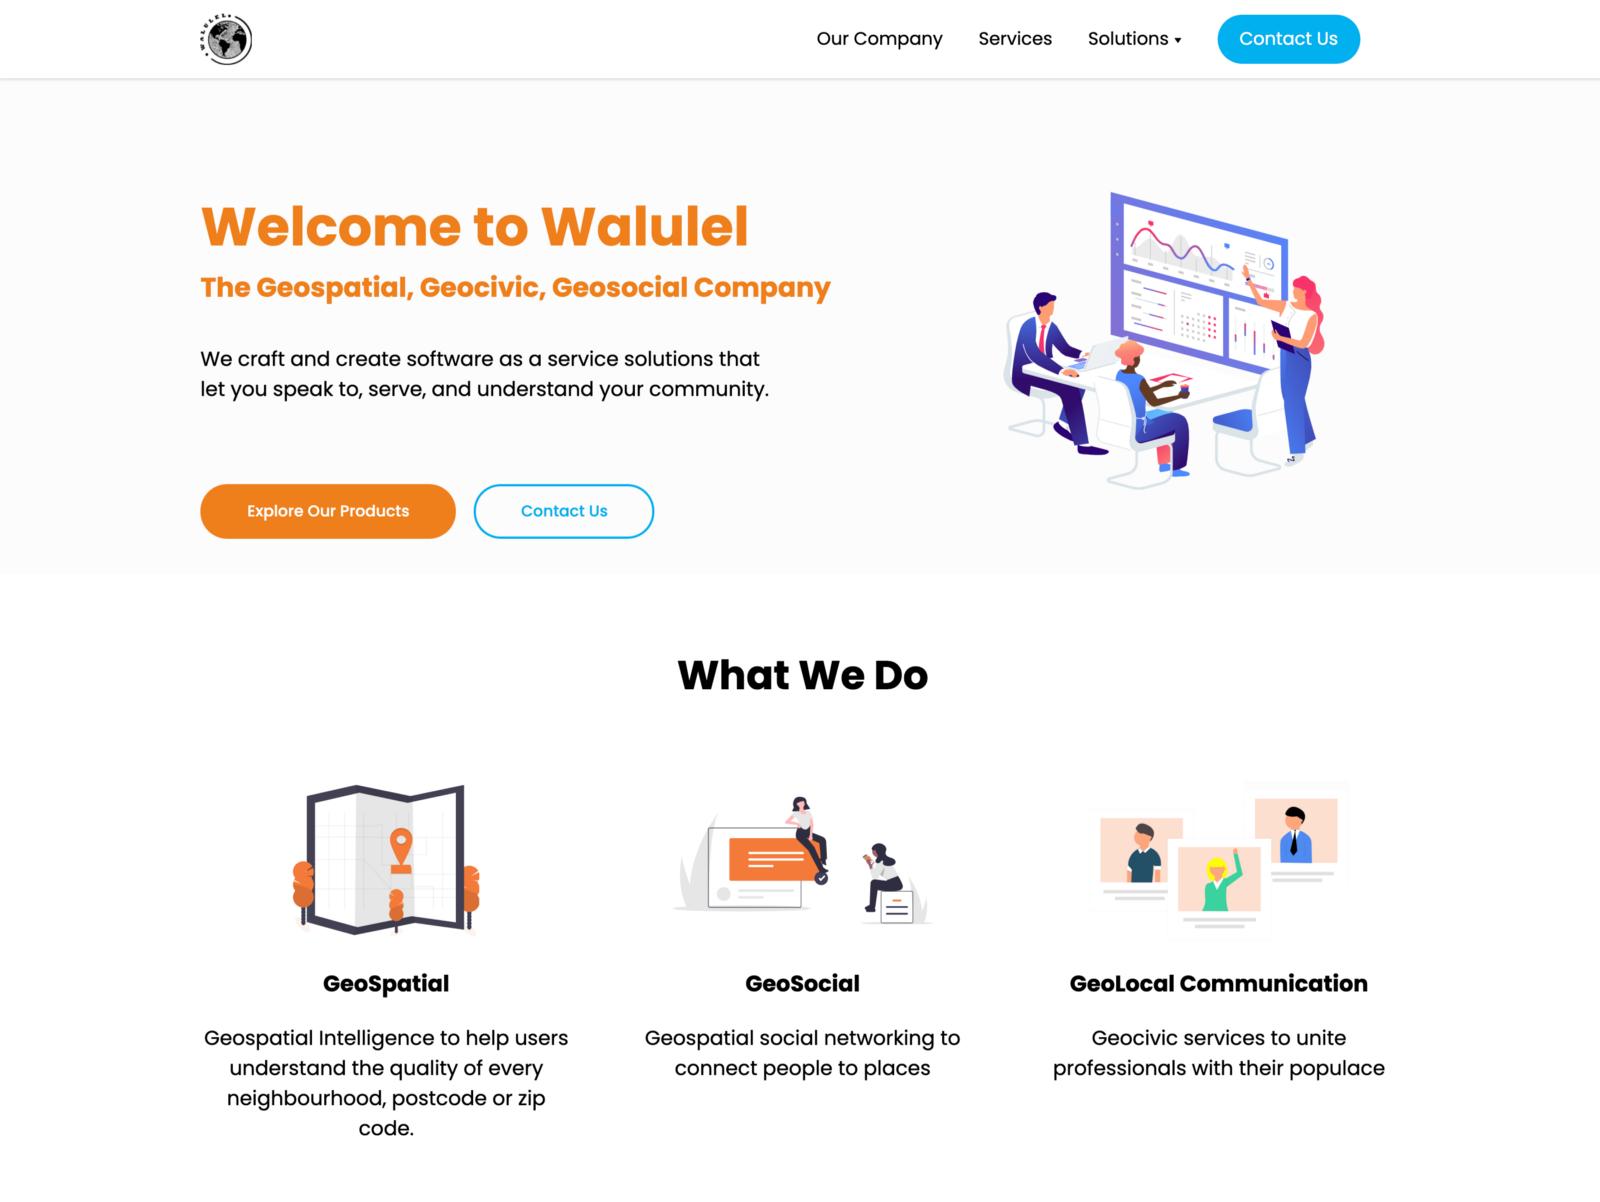 Screenshot of new Walulel website